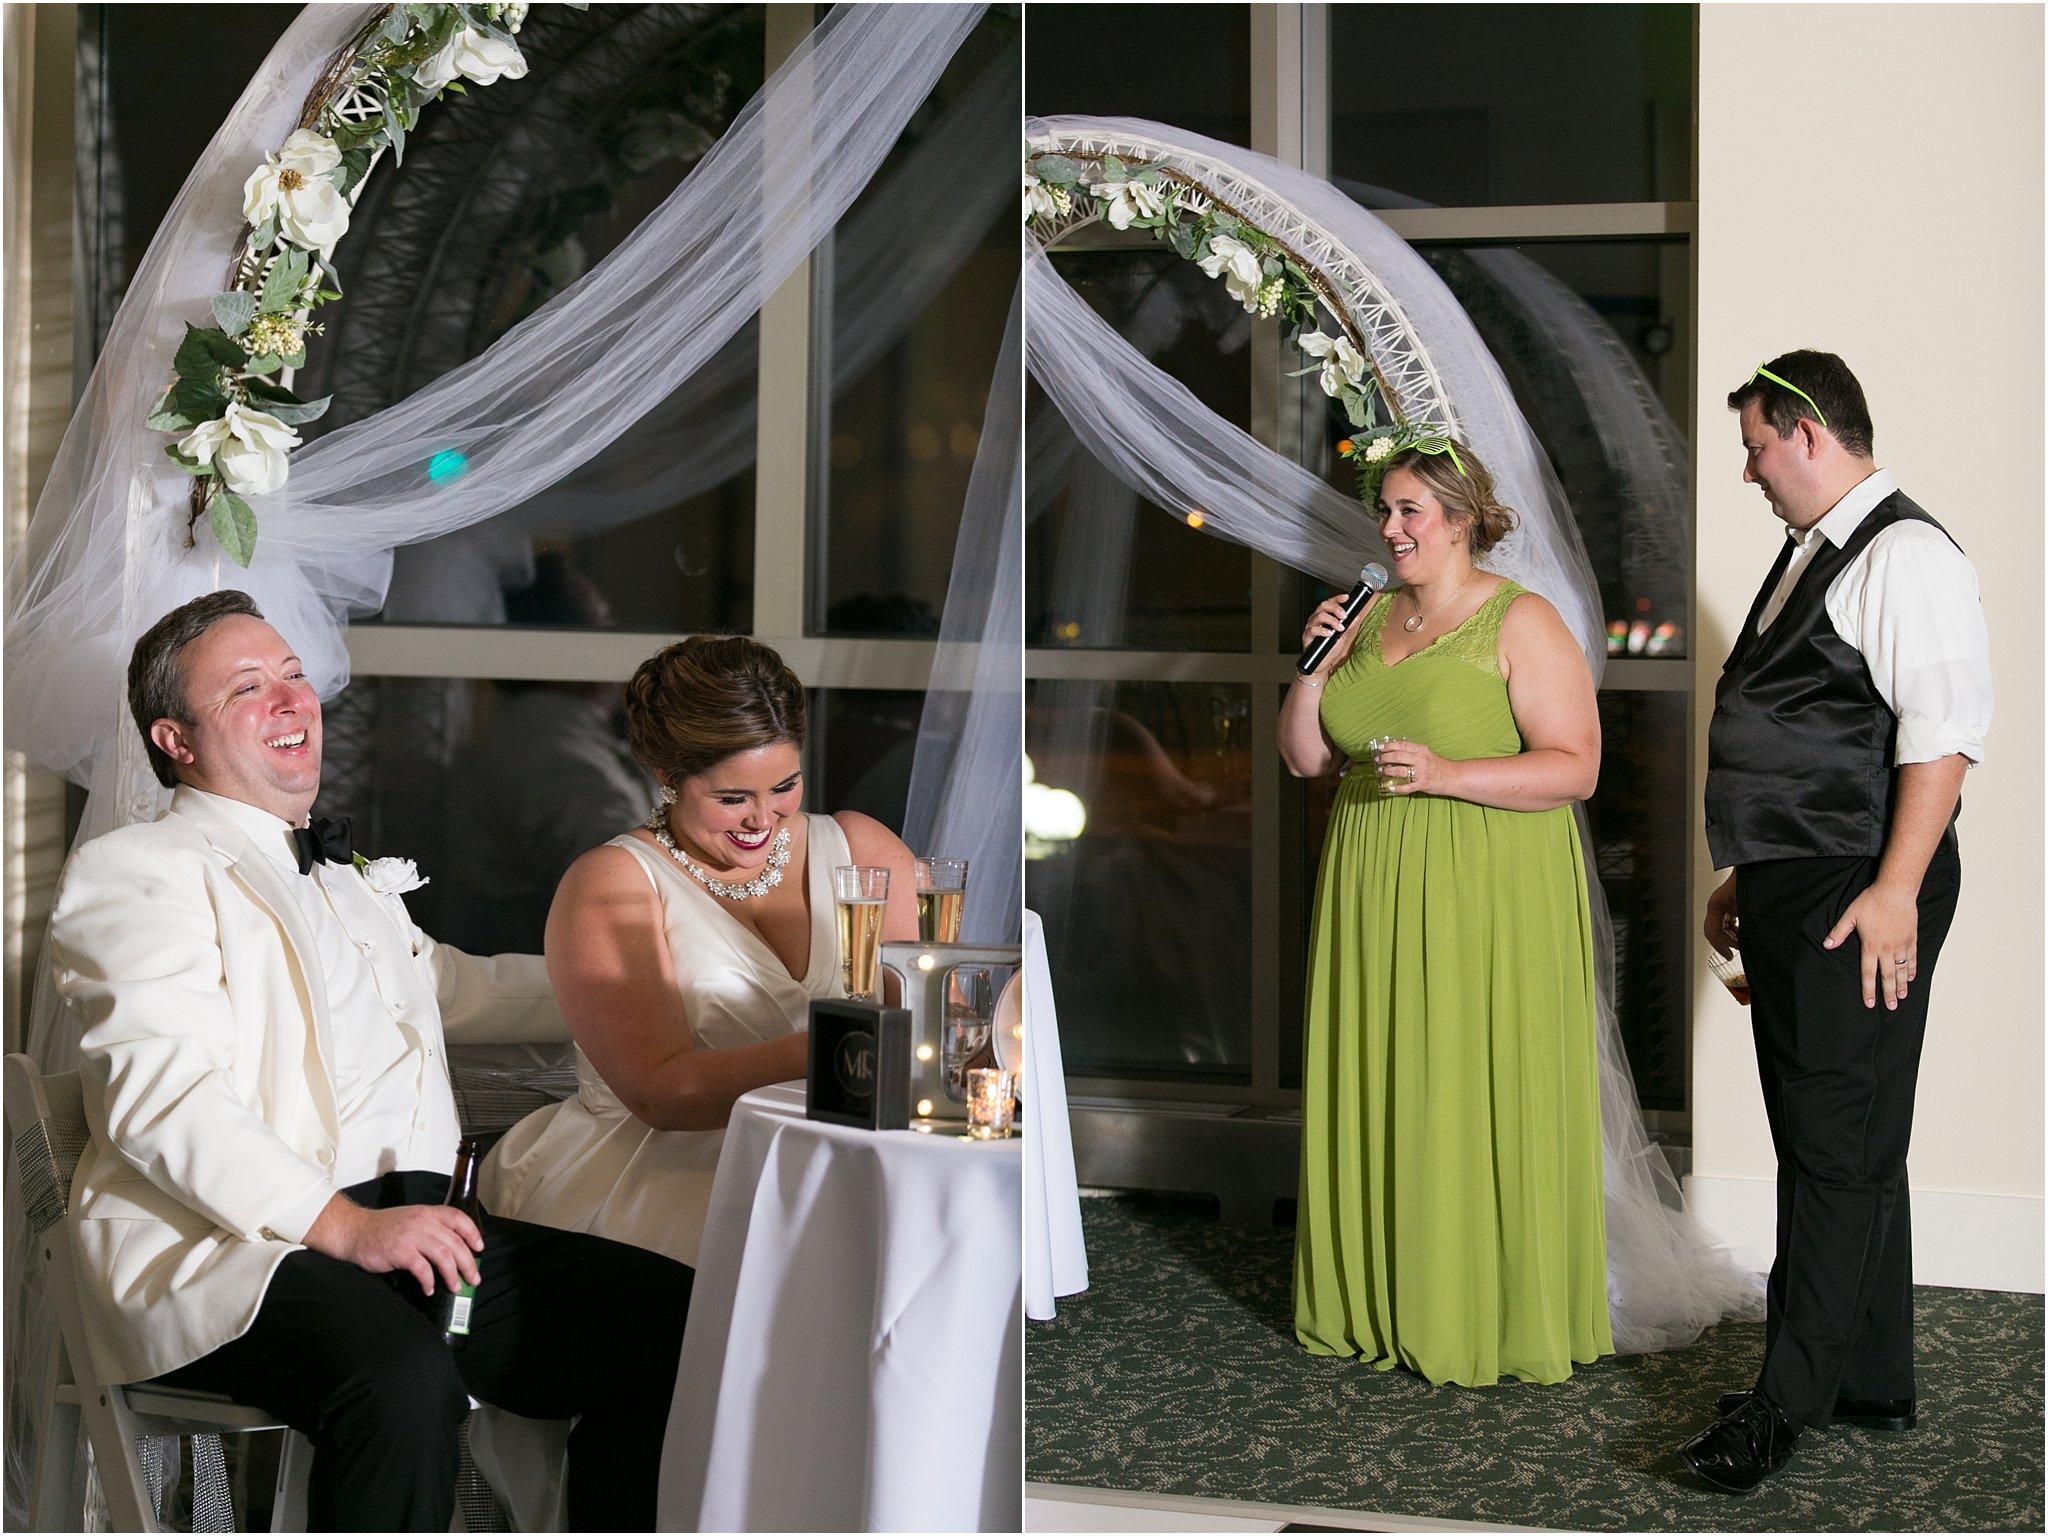 va_jessica_ryan_photography_virginia_wedding_norfolk_harrison_opera_house_norfolk_arts_district_portraits_3856